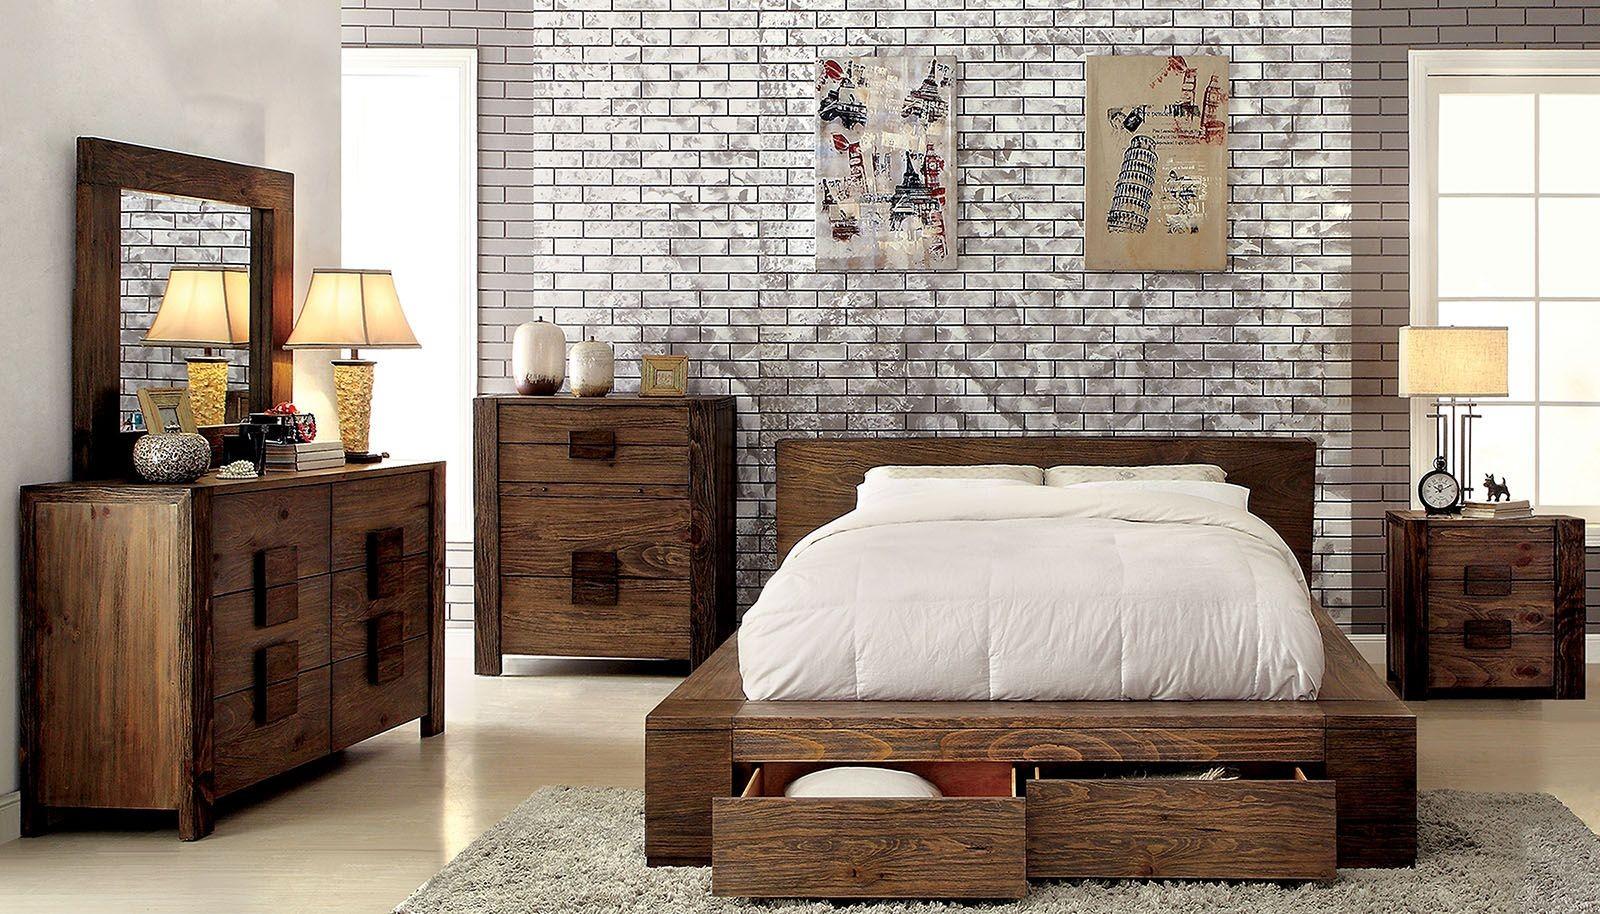 Janeiro rustic natural storage bedroom set cm q